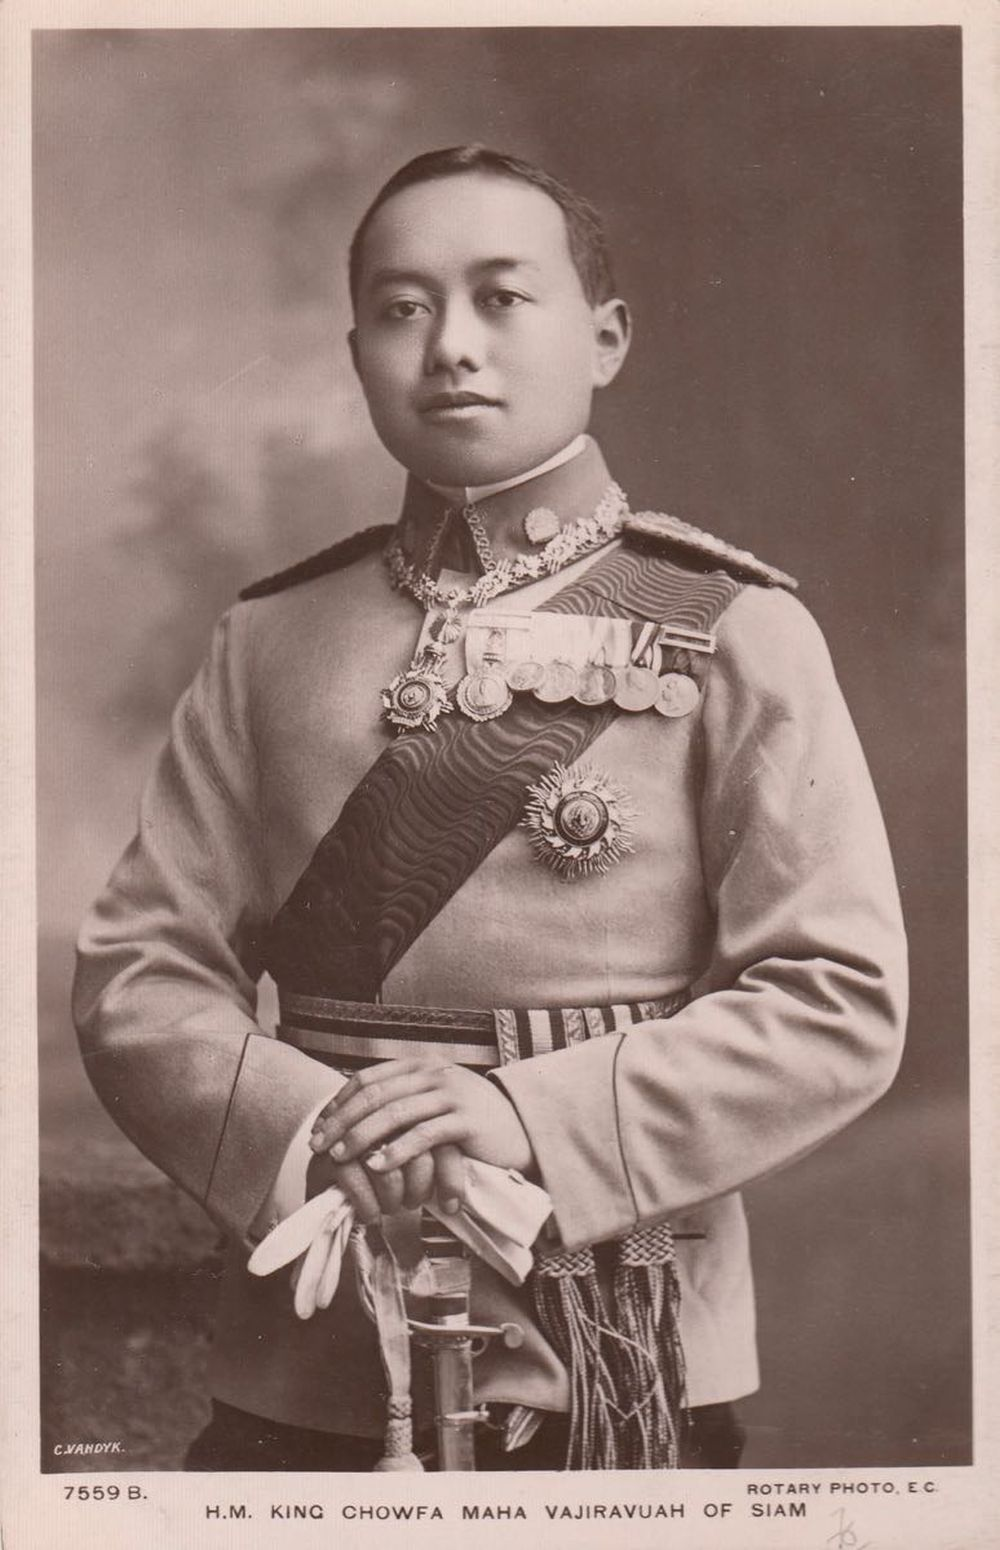 FAMILLES ROYALES SIAM. H. M. King Chowfa Maha Vajiravua